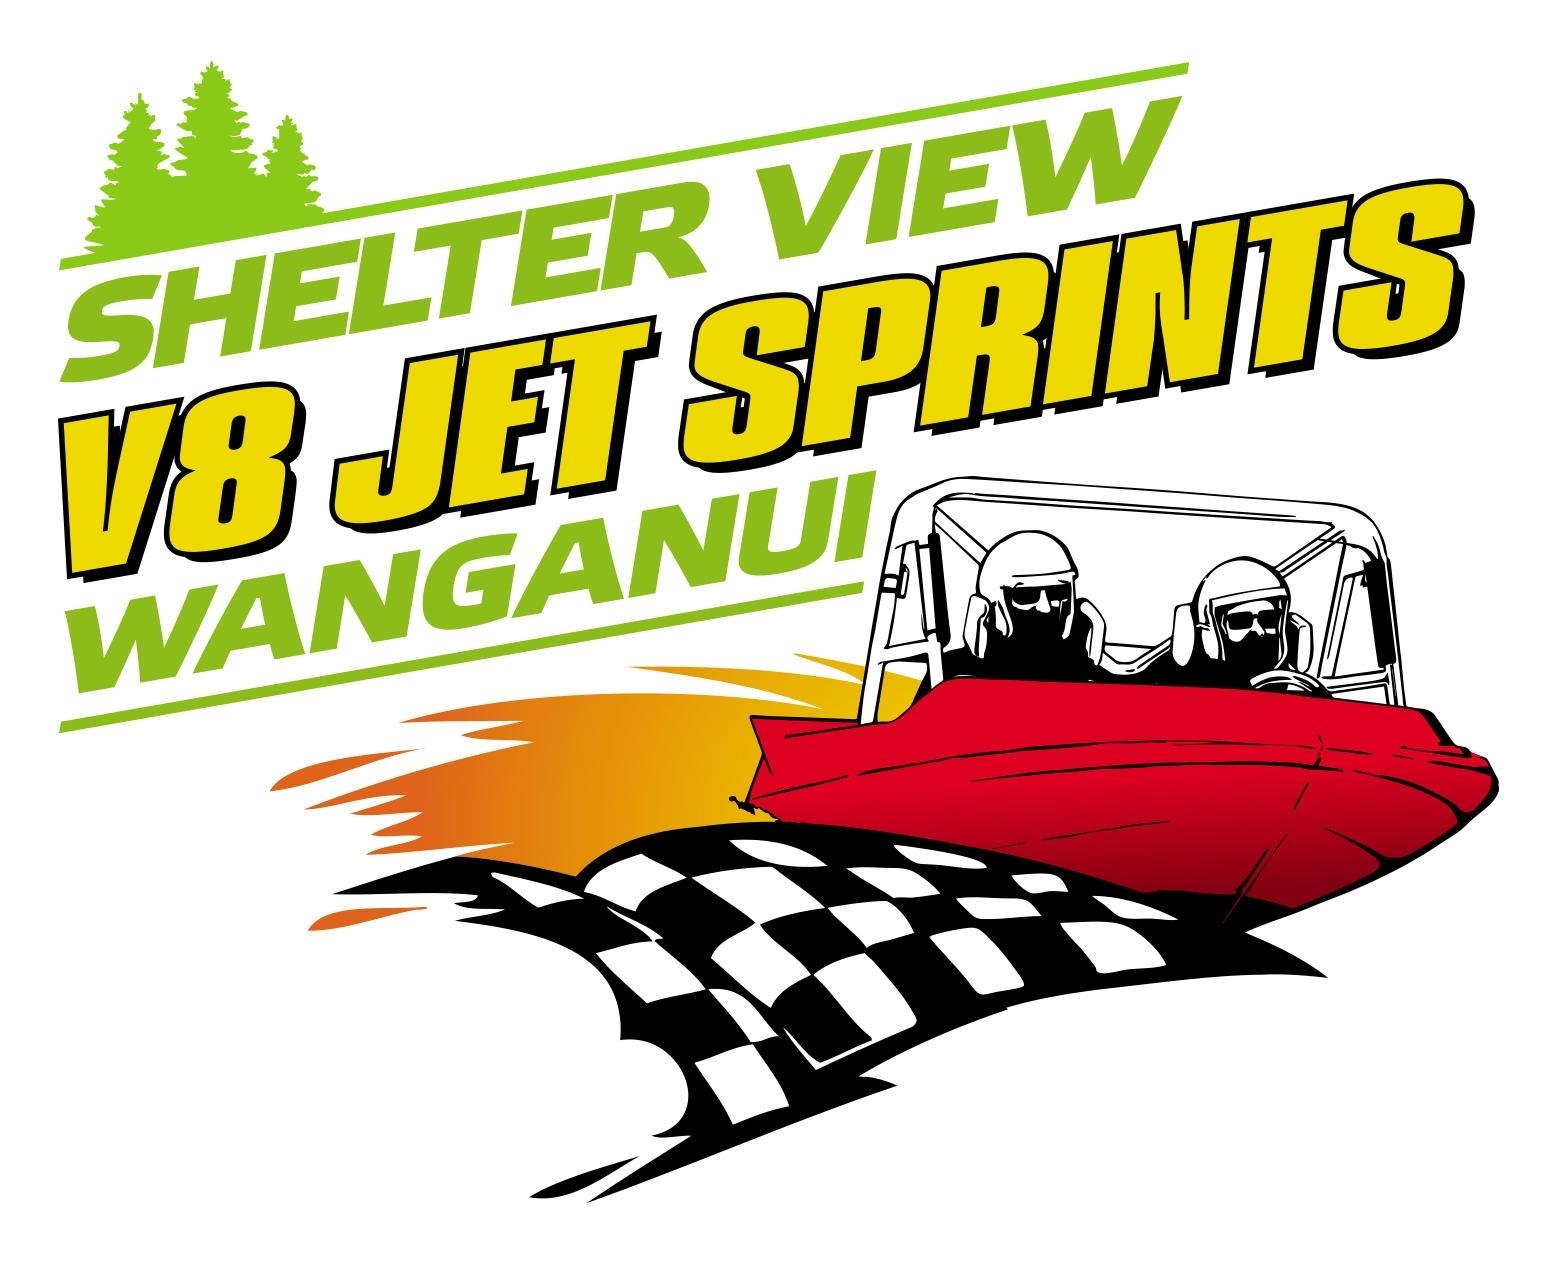 Shelter View Jetsprint Track Wanganui